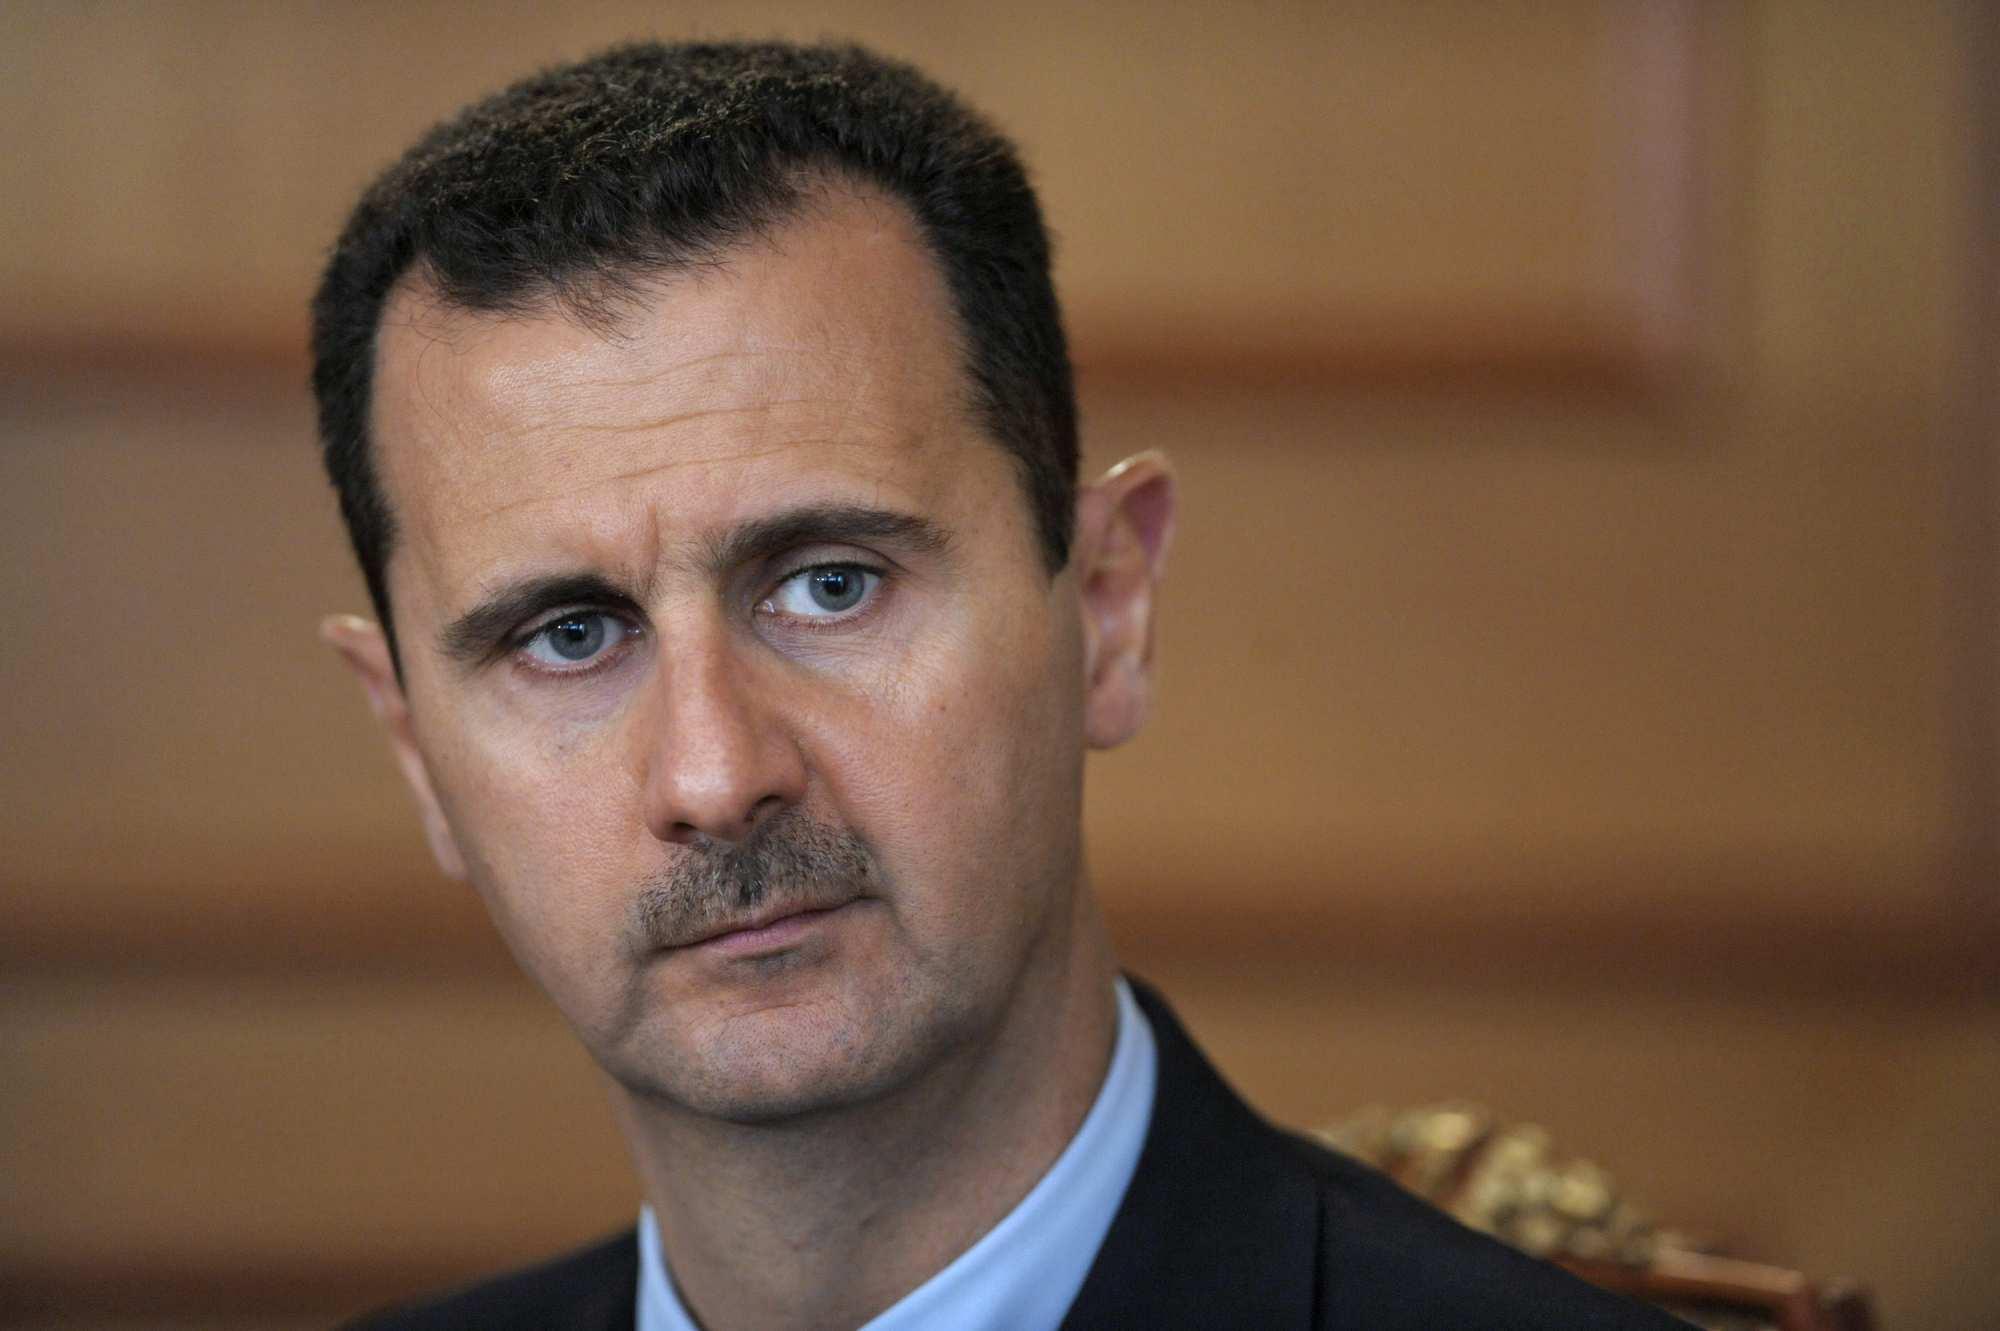 Сирия последние новости: Асад объявил широкую амнистию длядезертиров вСирии